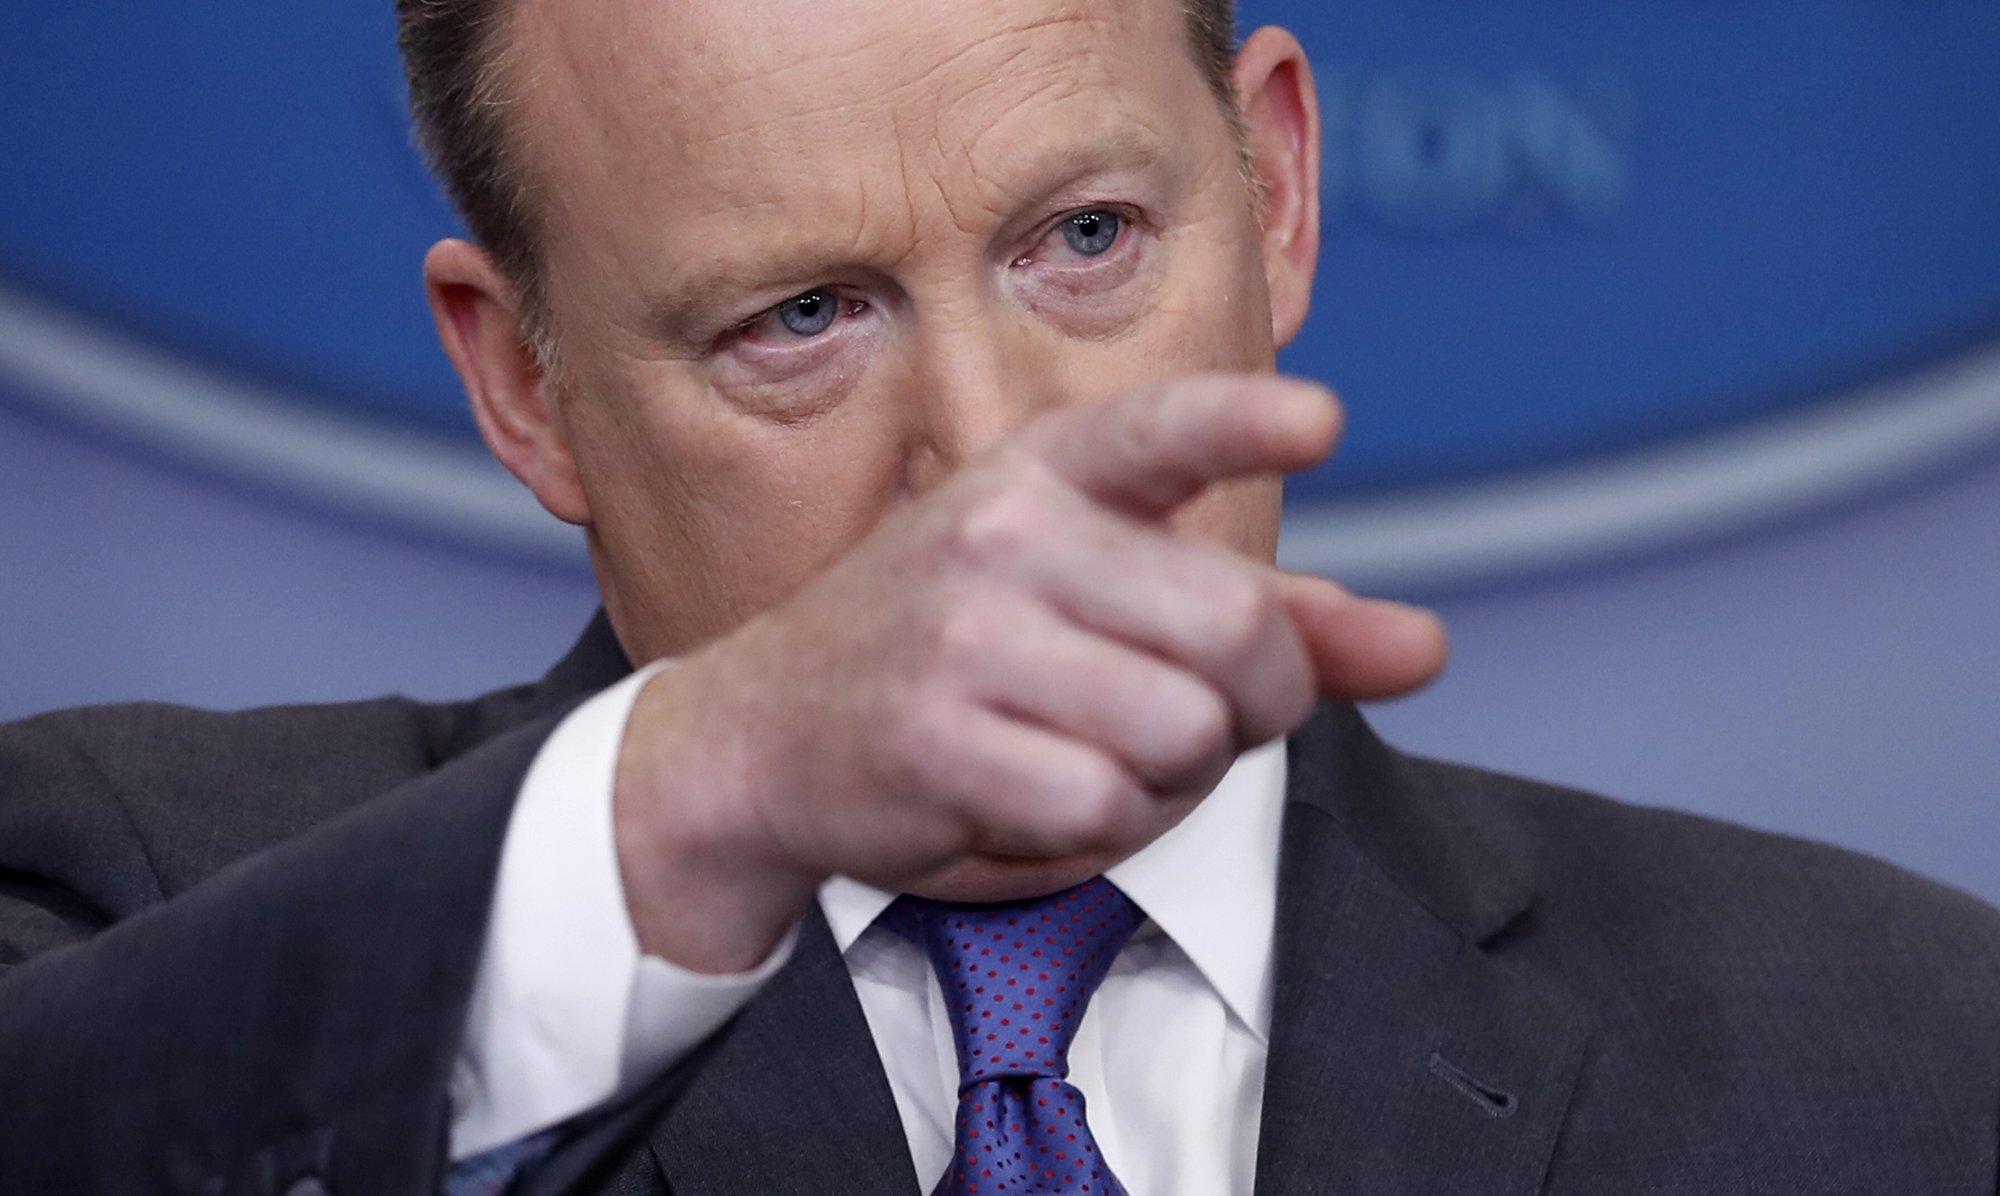 Diplomats defy White House warning, criticize travel ban